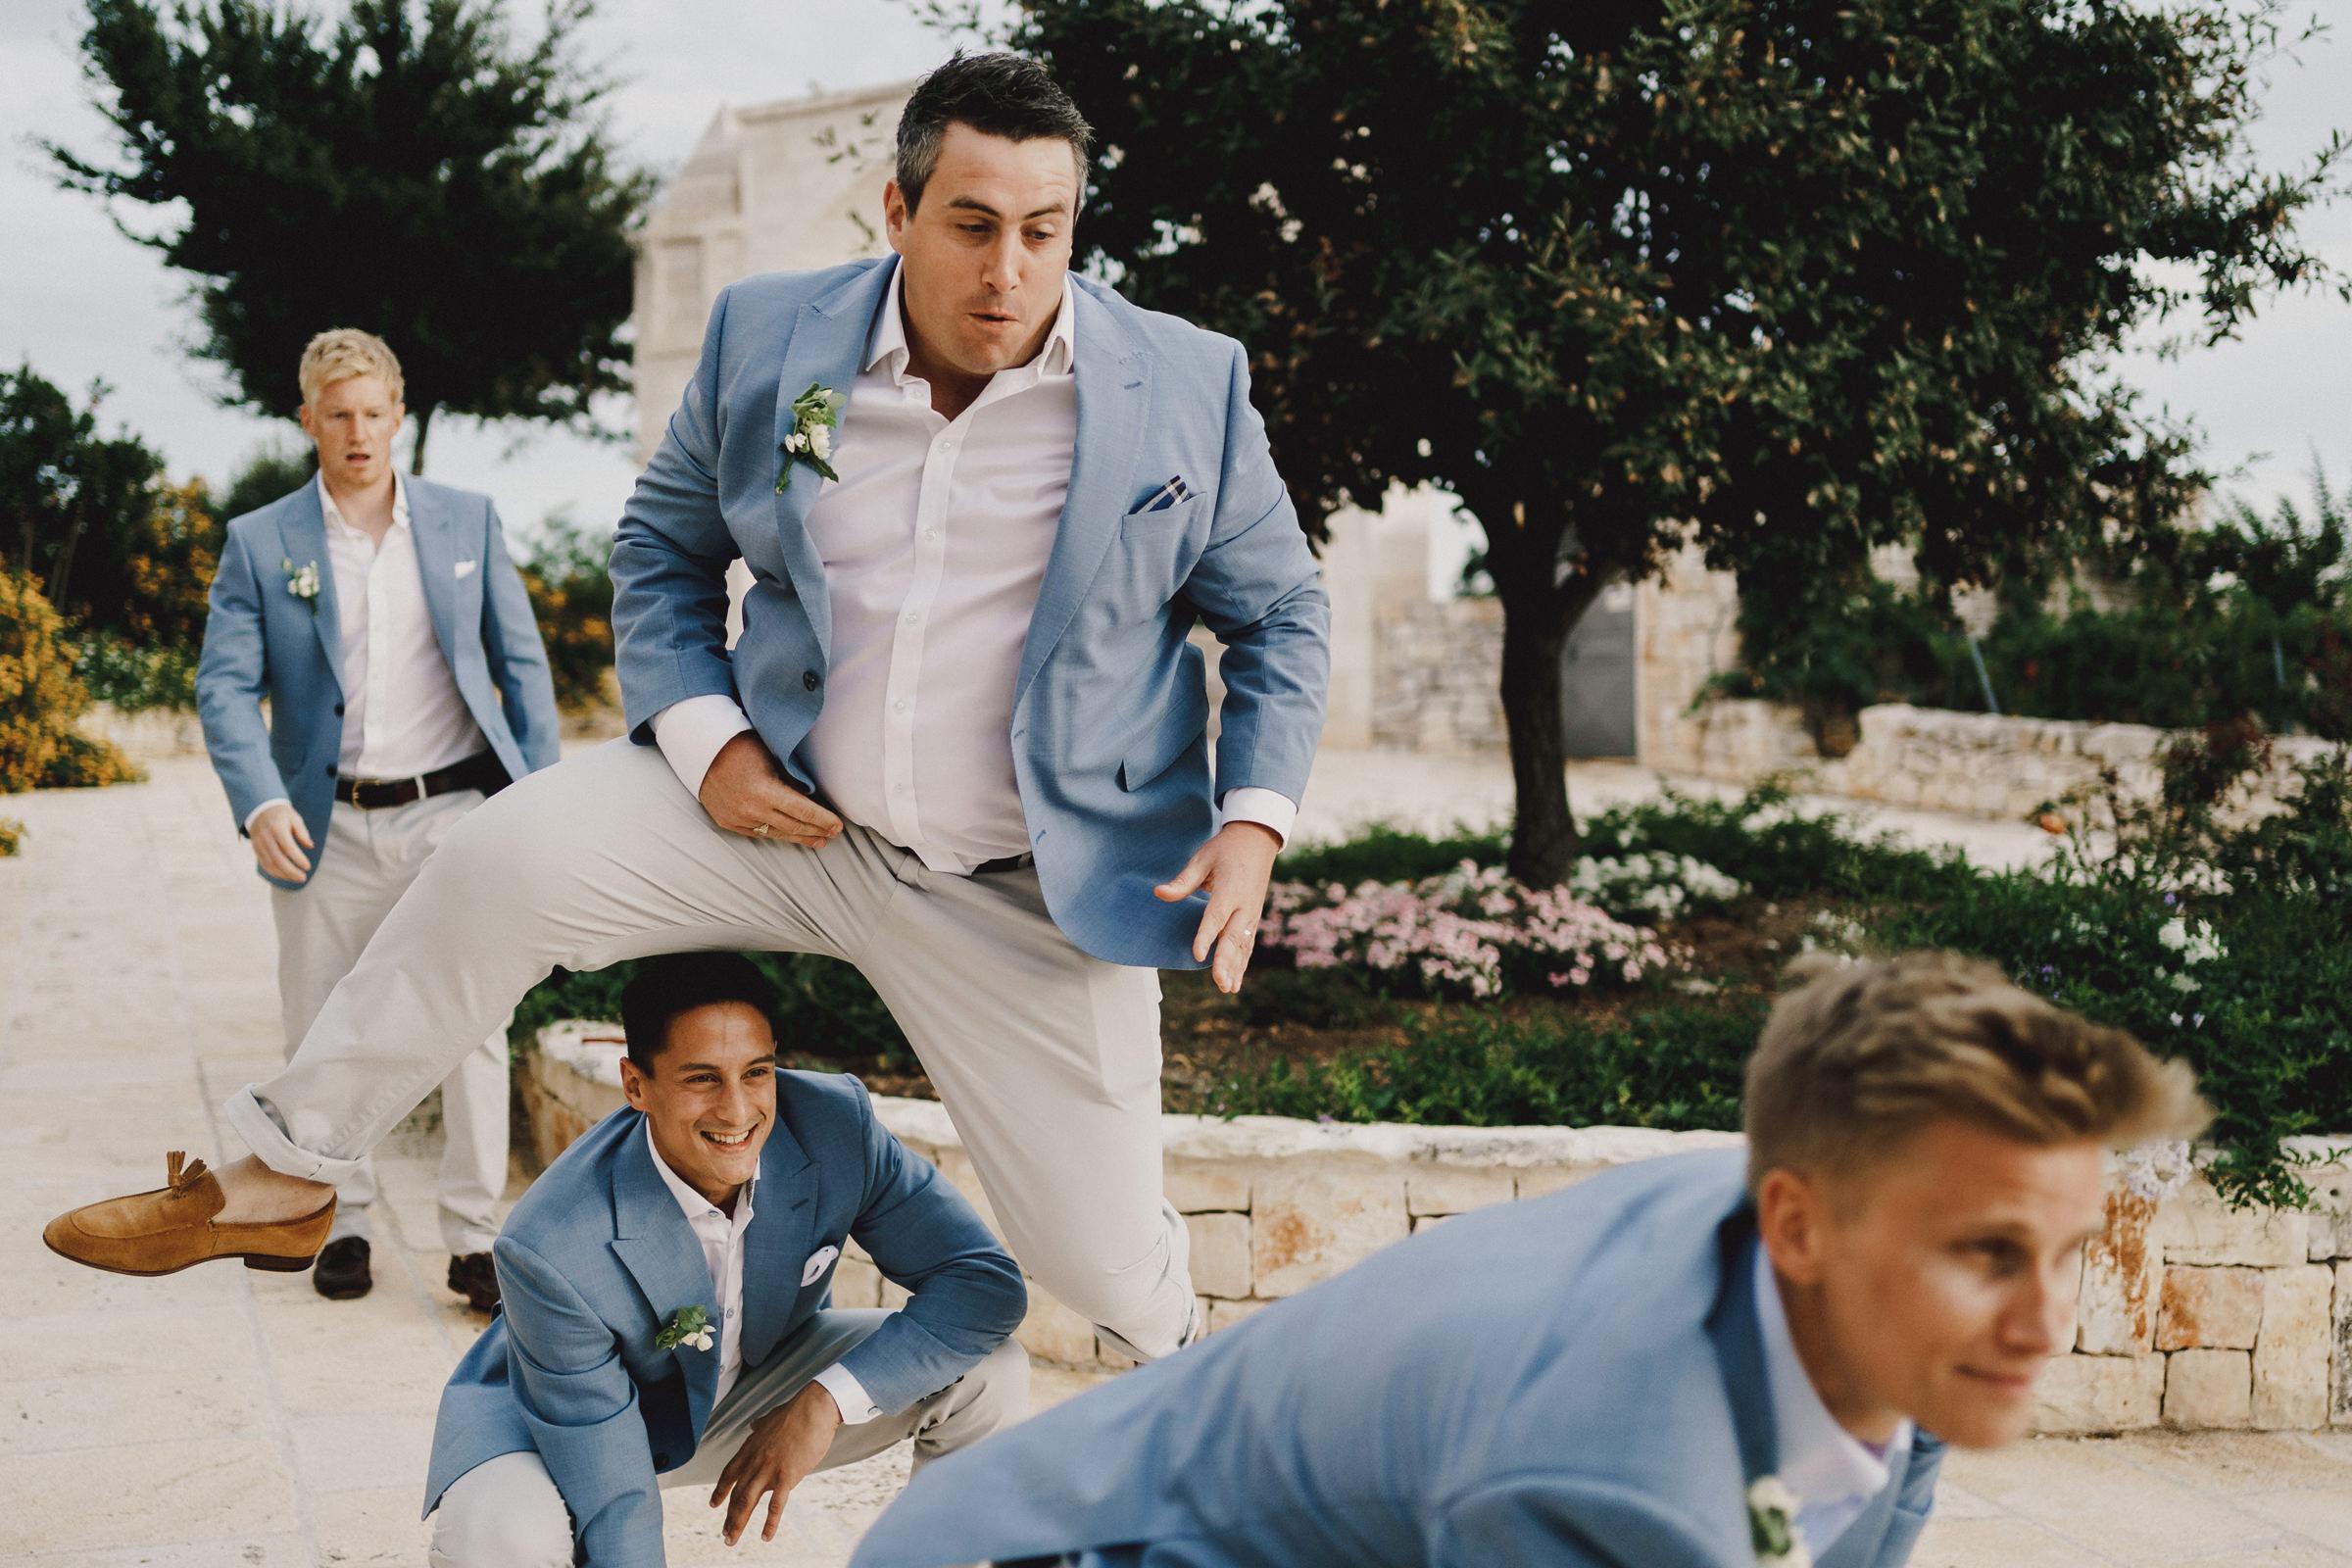 groomsmen-playing-leapfrog-miki-studios